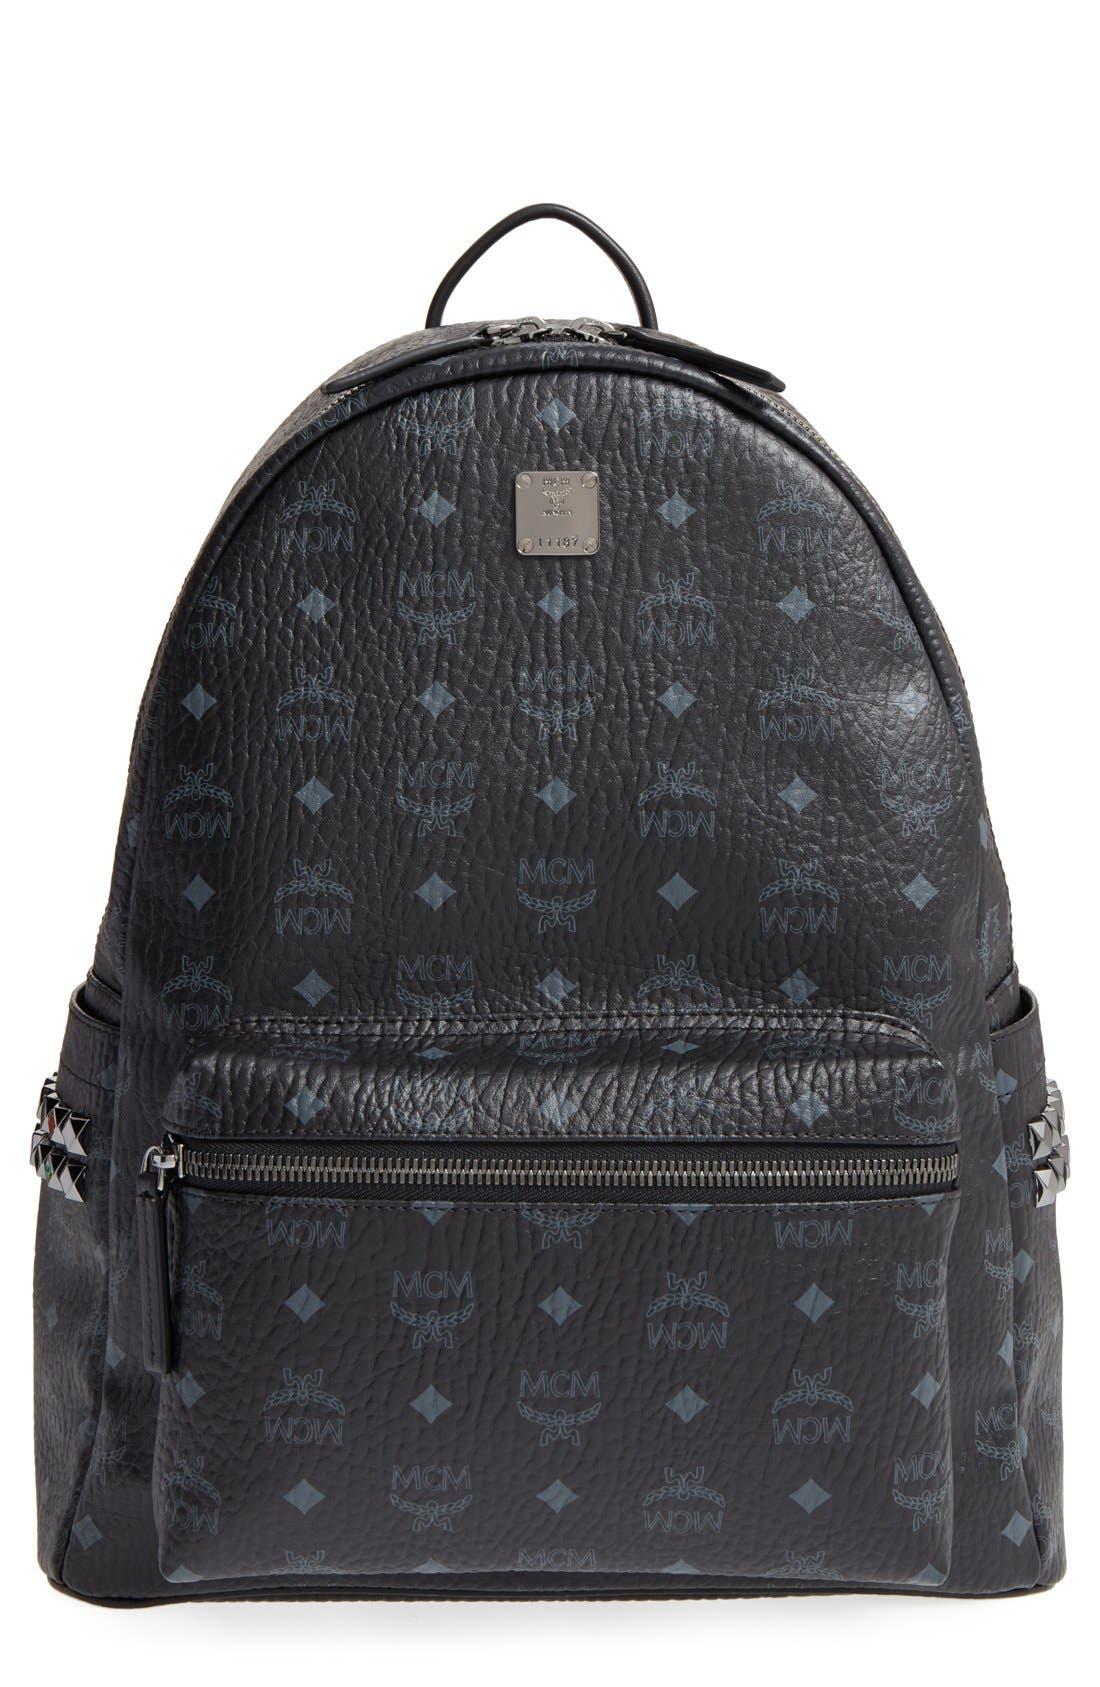 MCM Medium Stark Visetos Coated Canvas Backpack, Main, color, BLACK